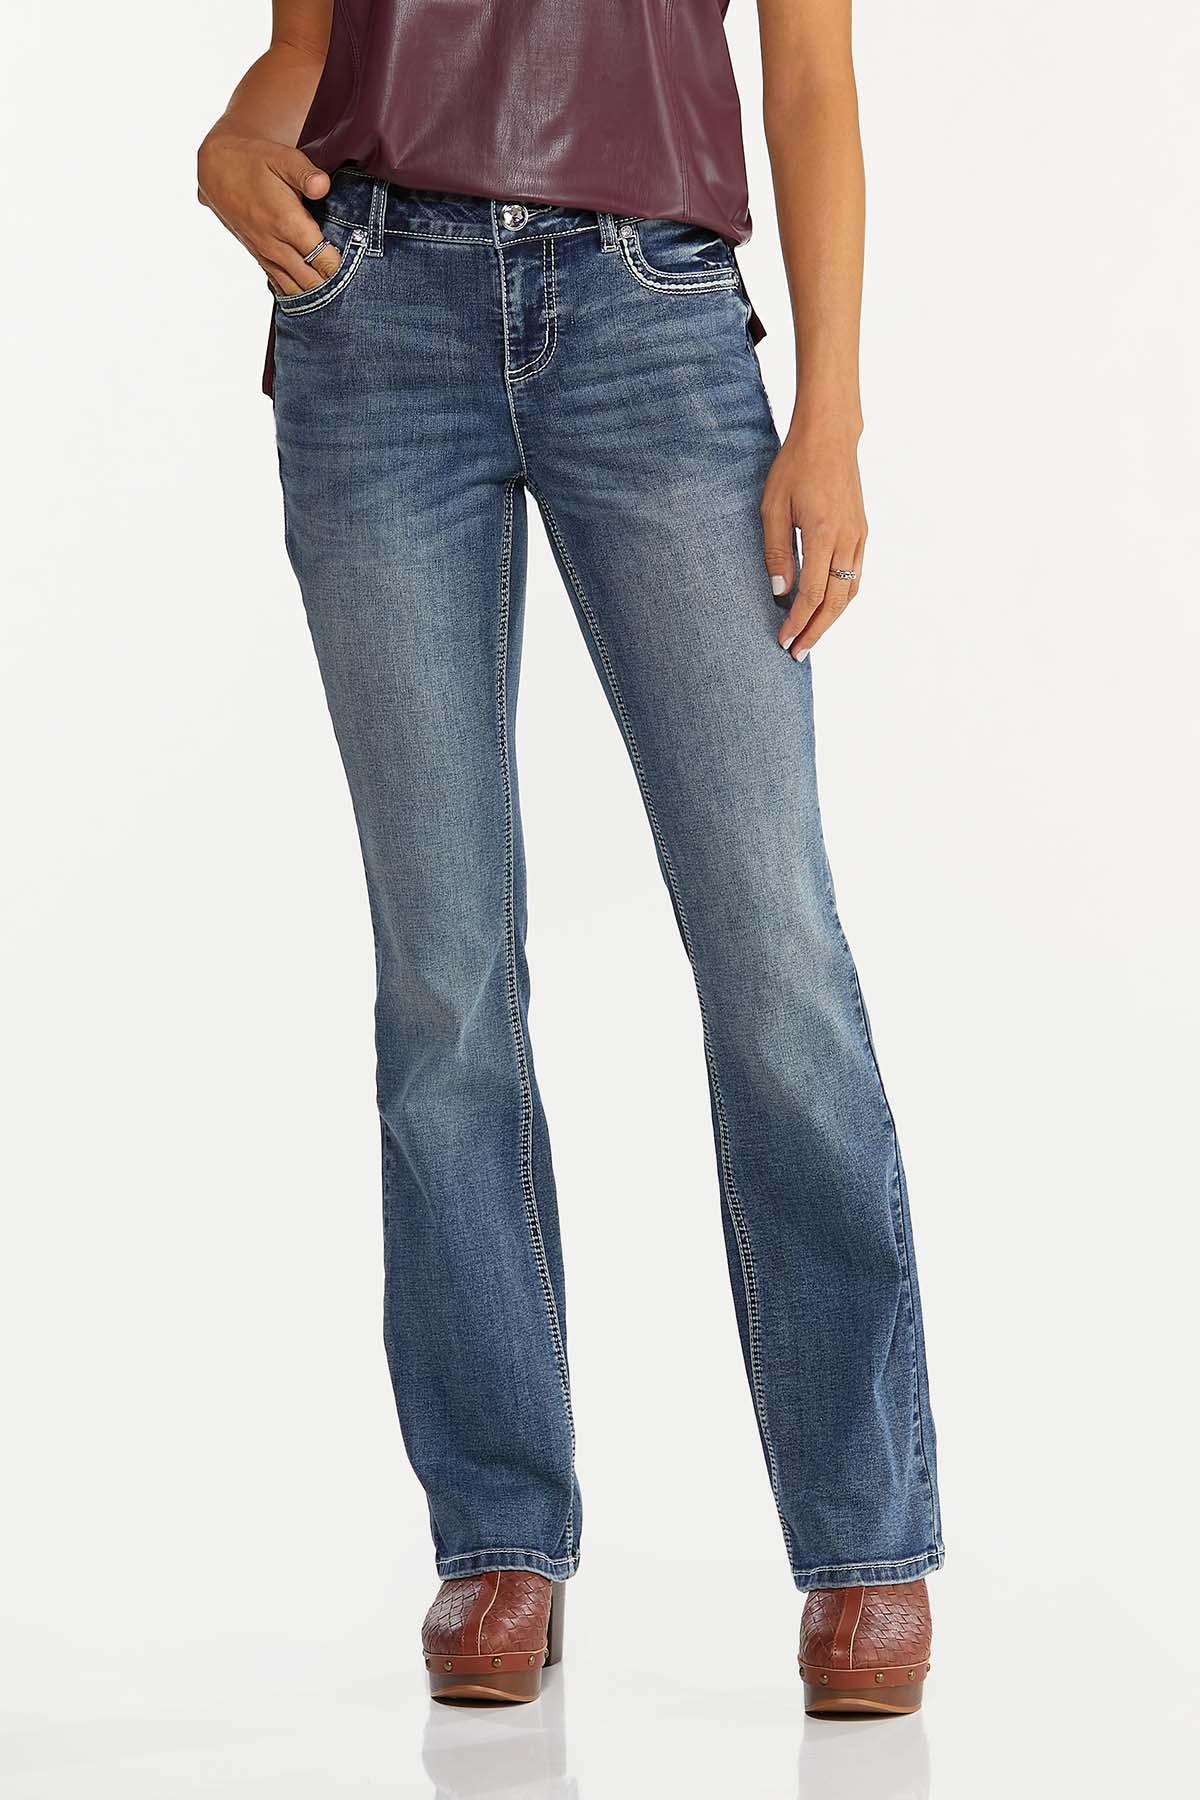 Petite Star Studded Bootcut Jeans (Item #44674425)